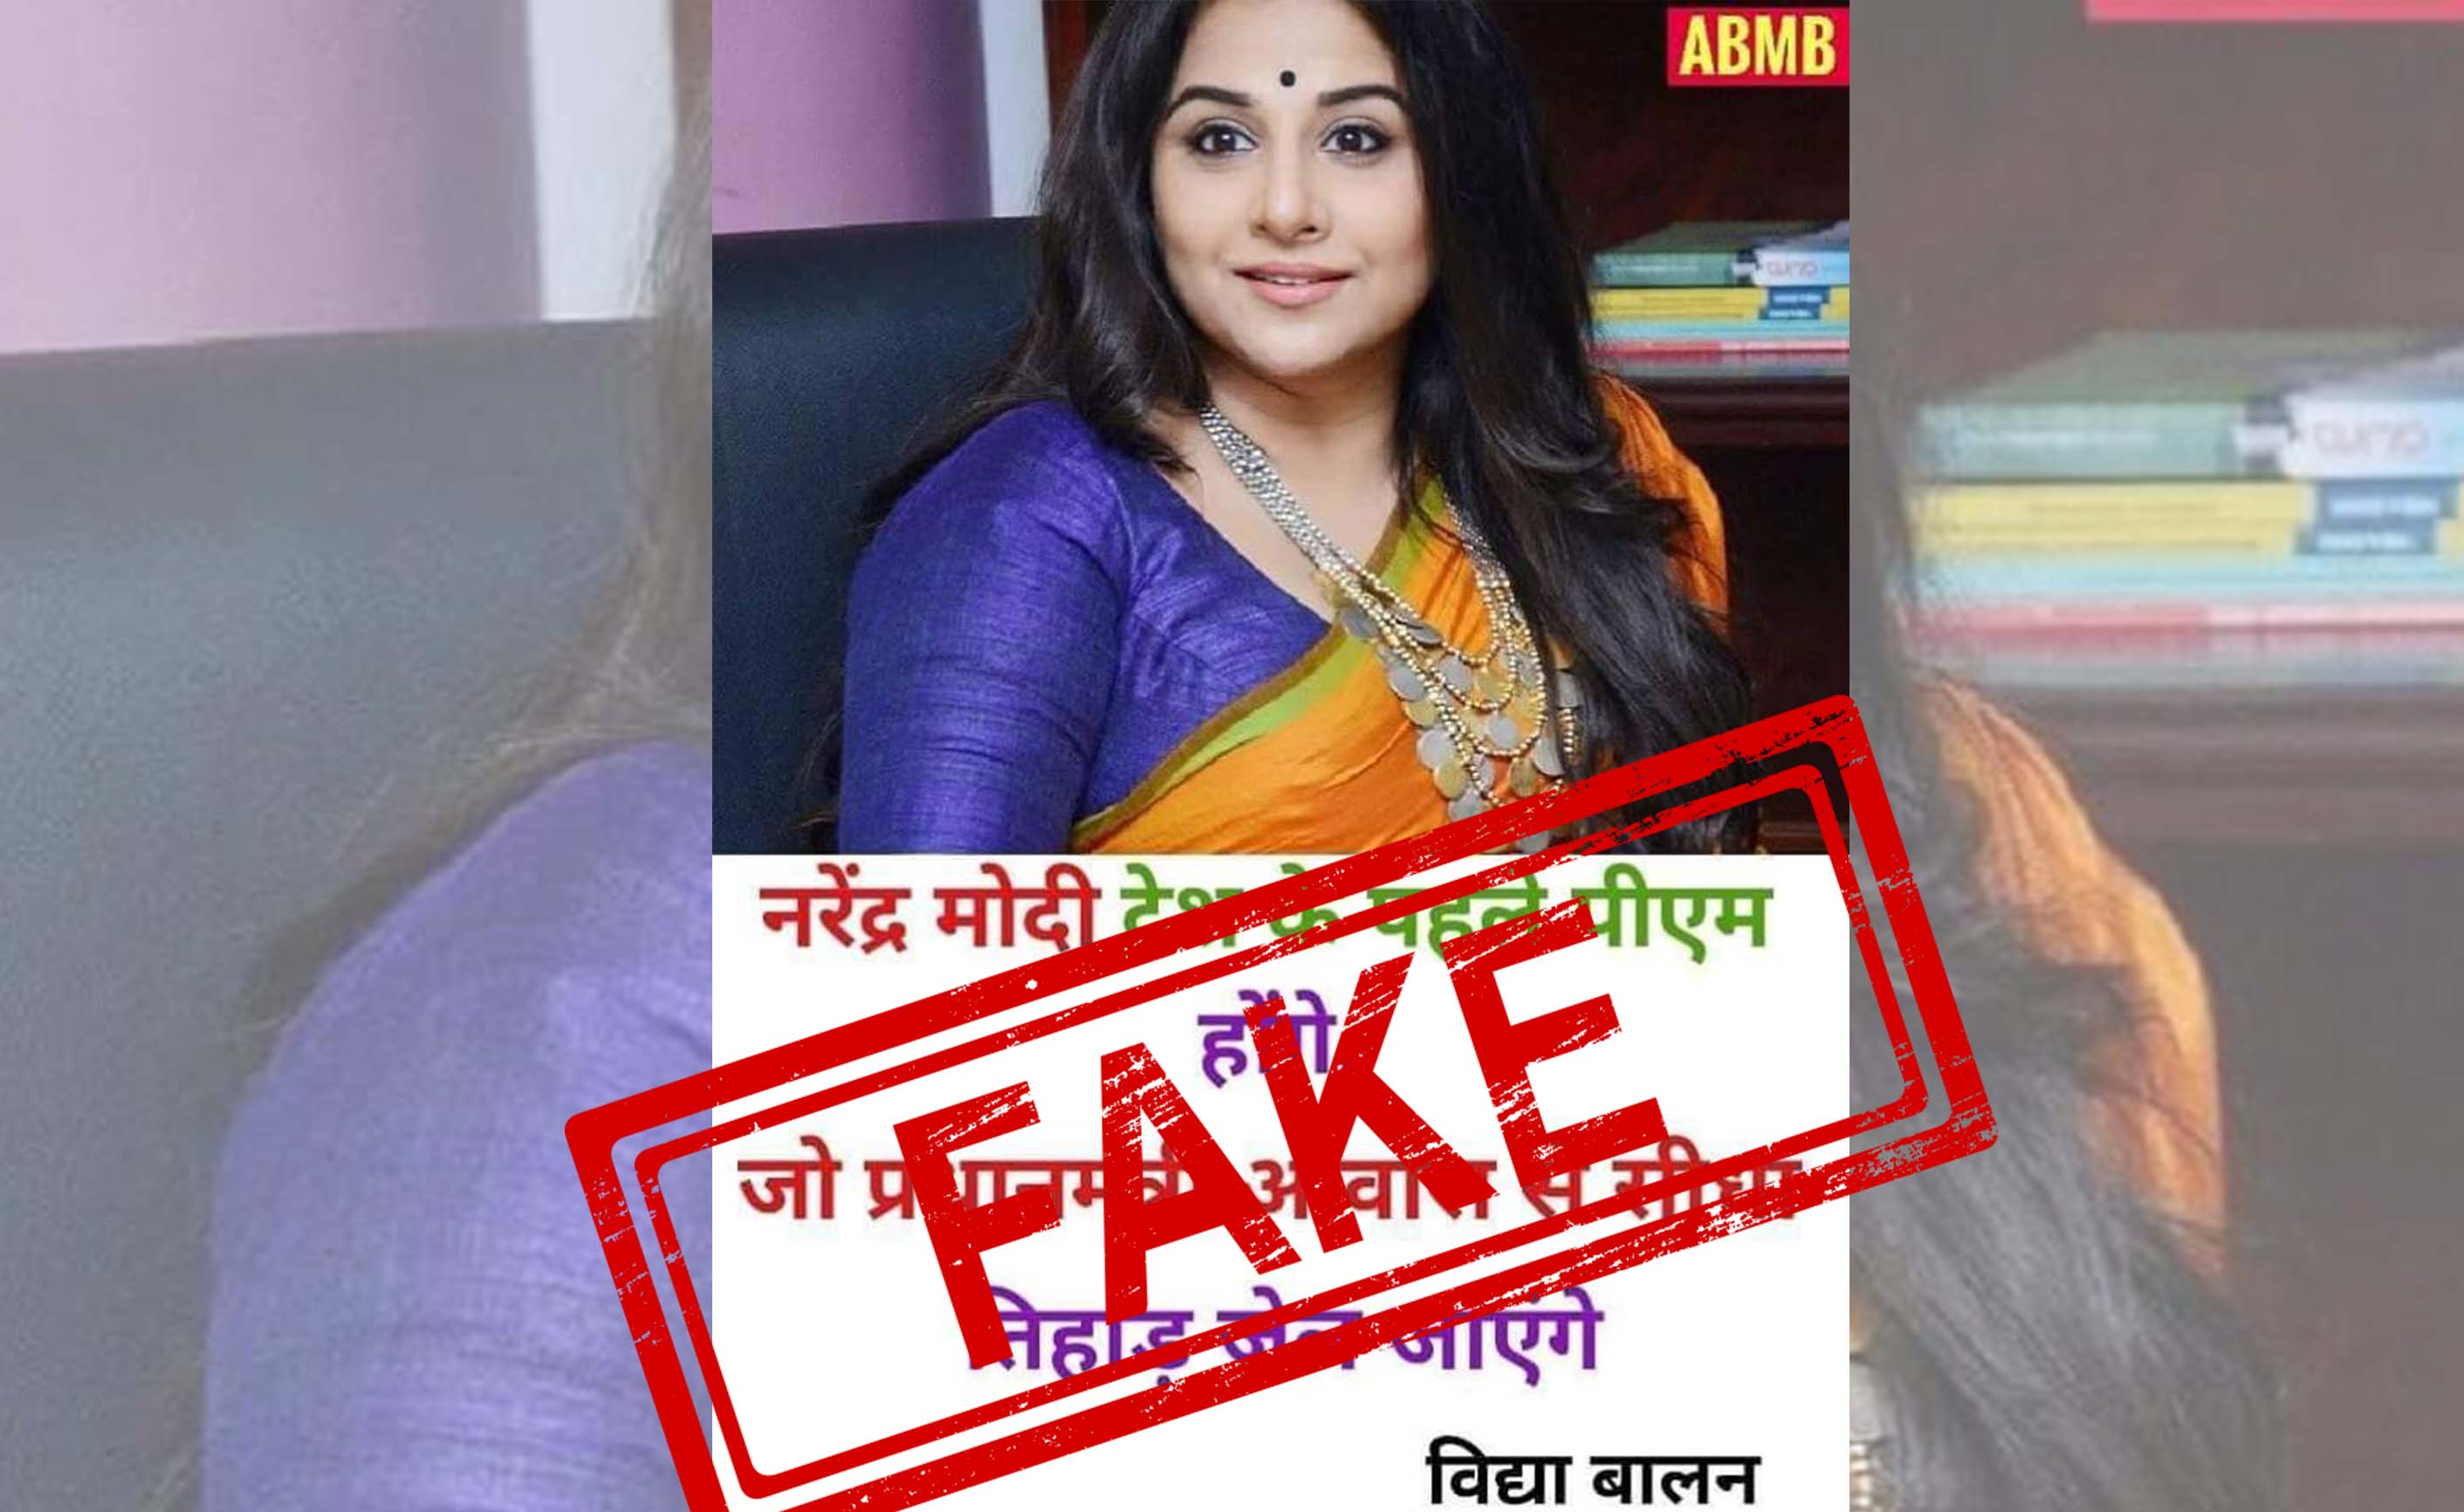 Vidya Balan, Prime Minister, Narendra Modi, Statement, NewsMobile, Mobile, News, India, BJP, Fact Check, Fact Checker, India, FAKE